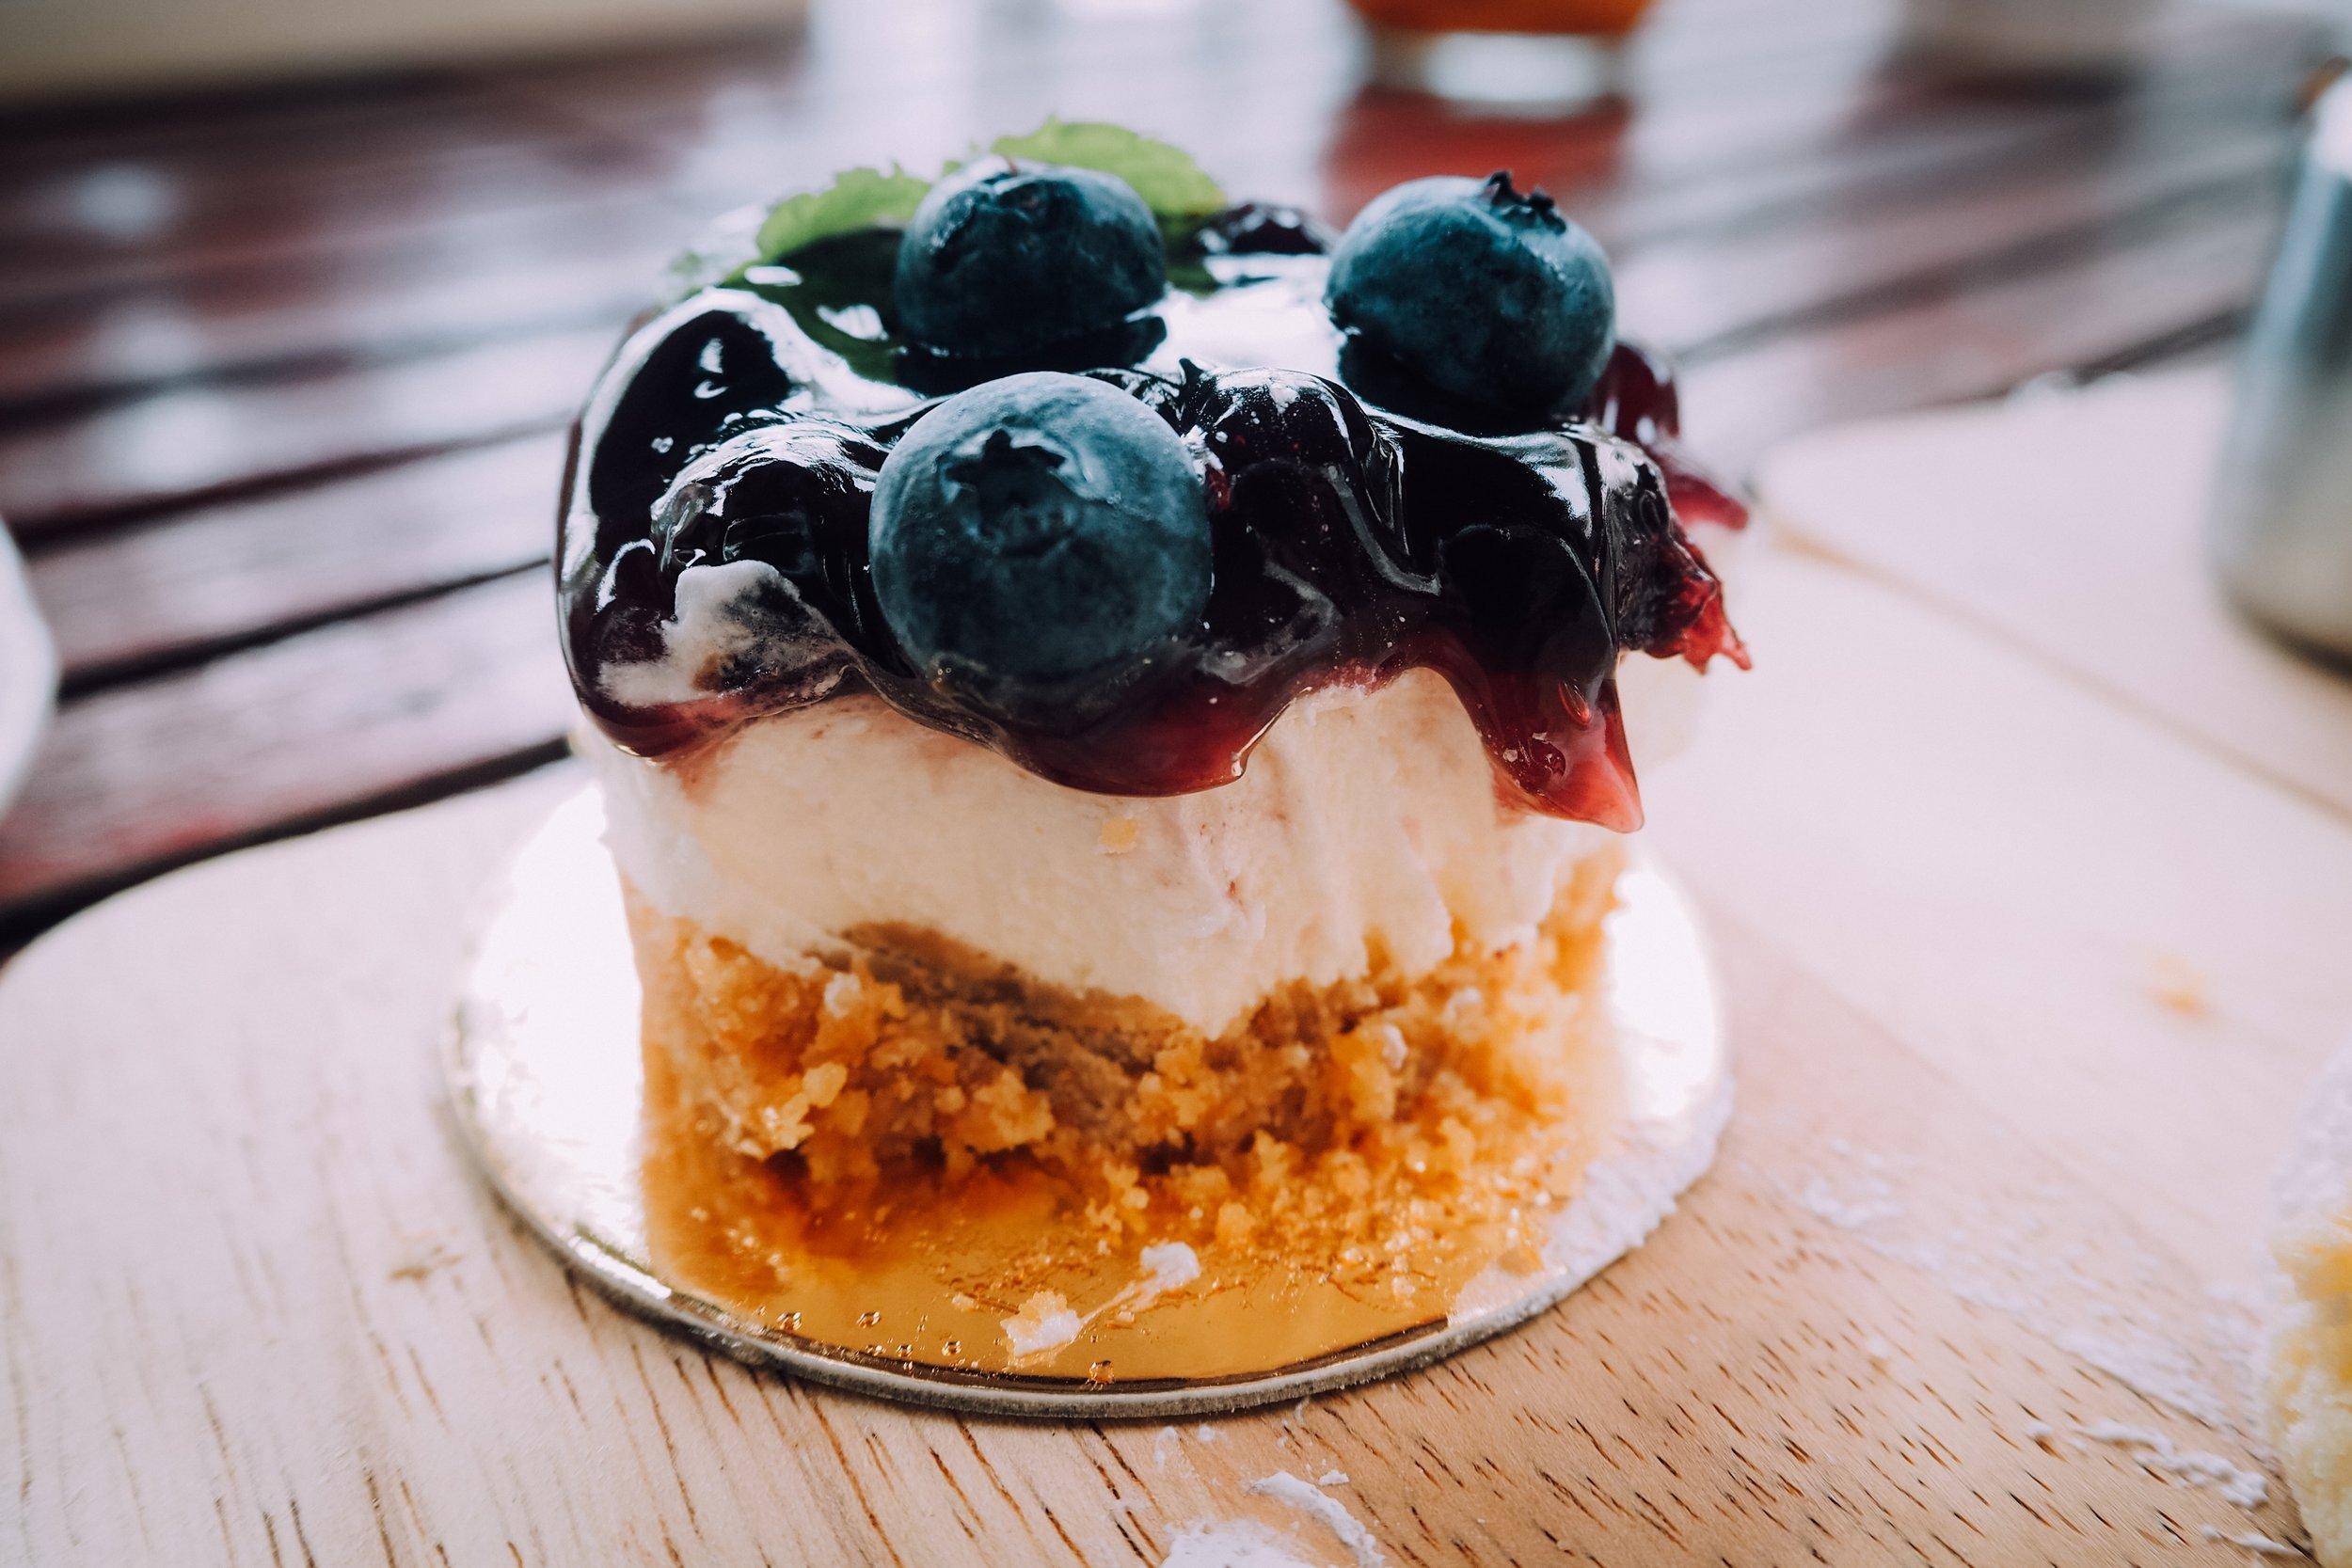 dish-food-produce-baking-dessert-cuisine-50853-pxhere.com.jpg